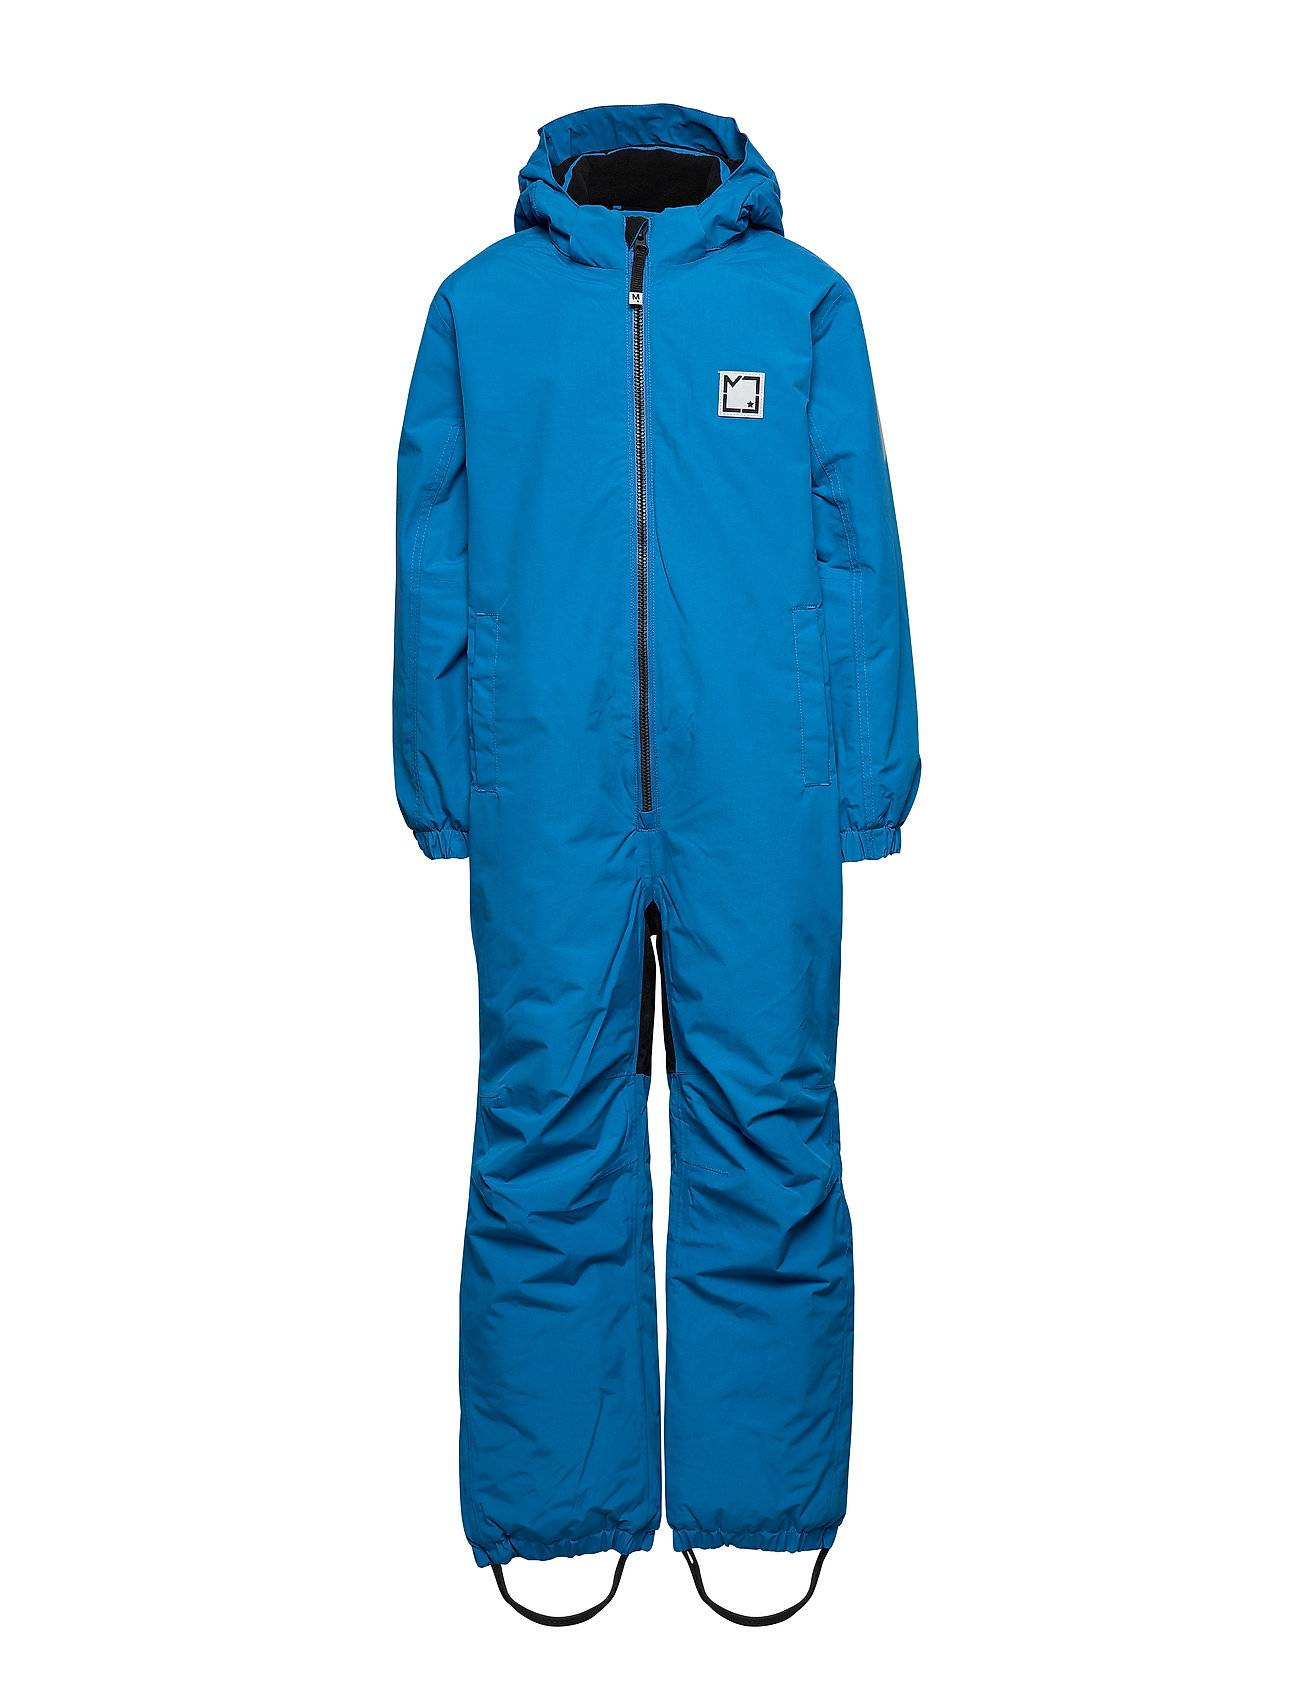 Molo Haze Outerwear Snow/ski Clothing Snow/ski Suits & Sets Sininen Molo